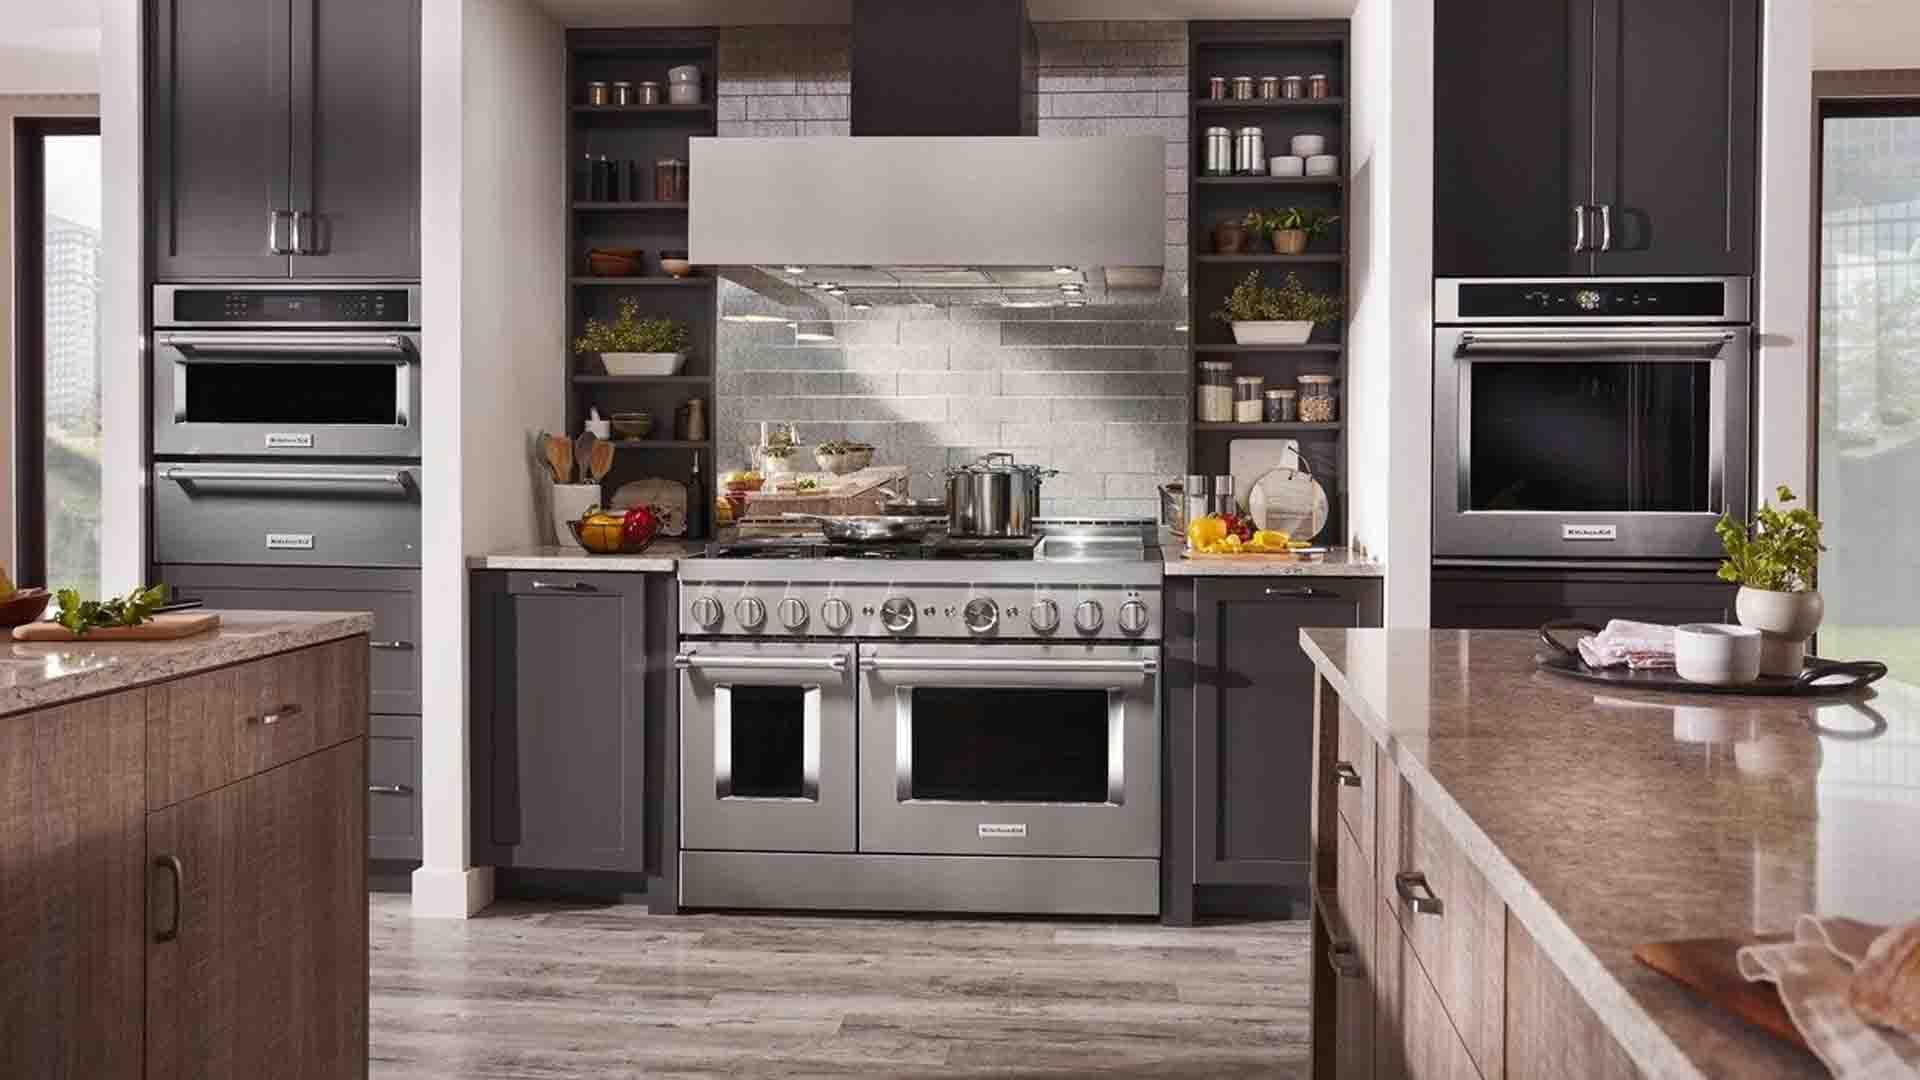 kitchenaid appliance repair service near me   Kitchenaid Repairs